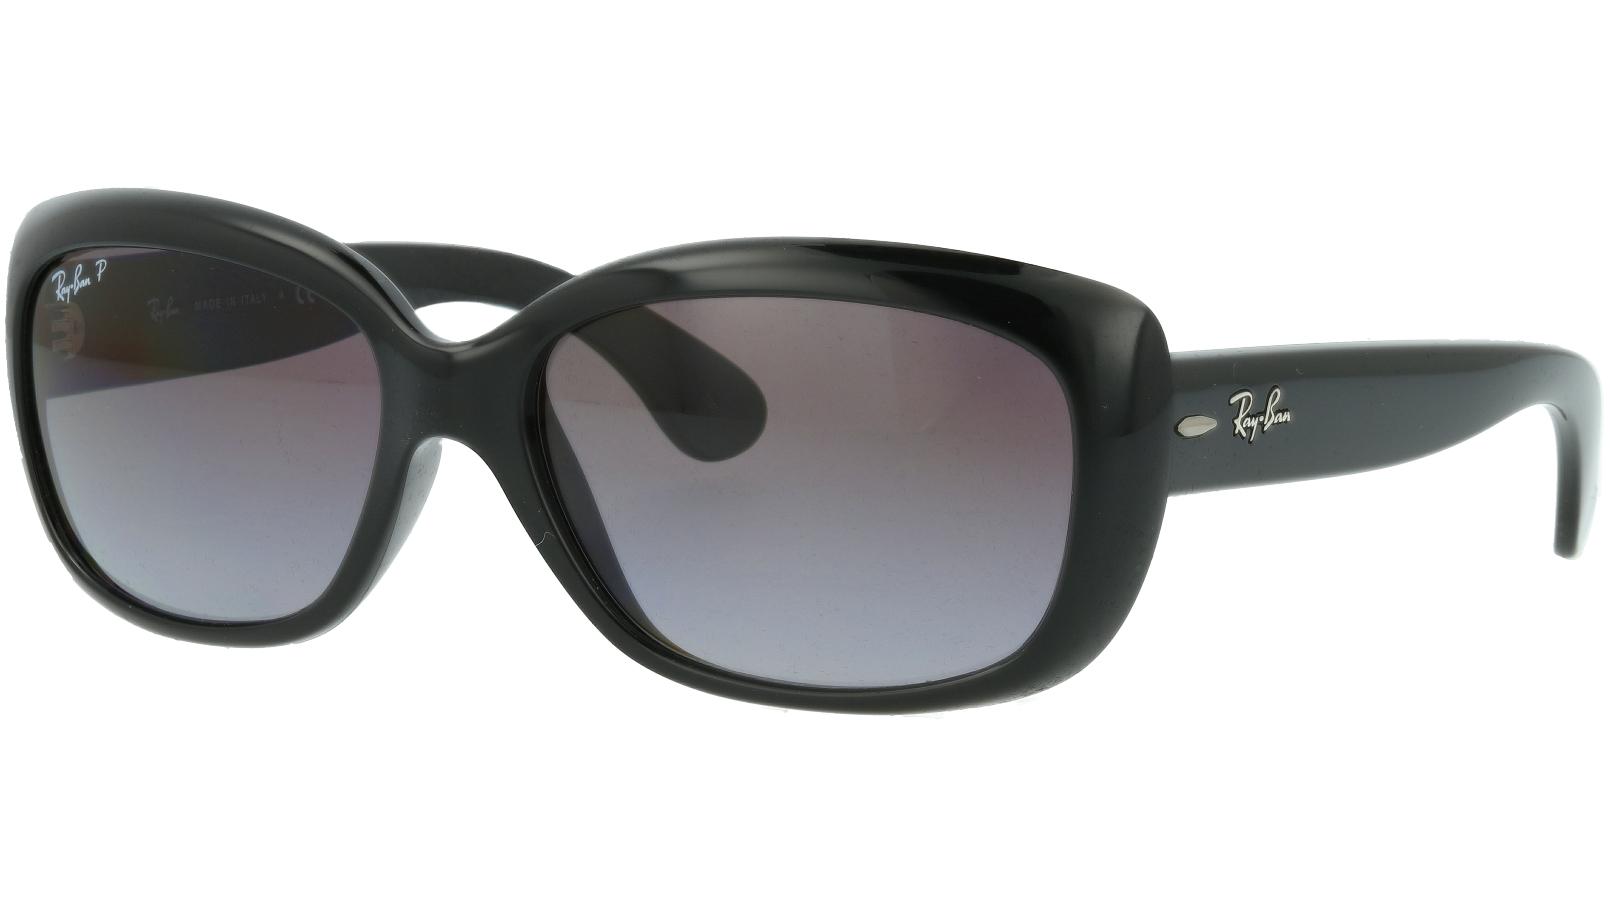 Ray-Ban RB4101 601/T3 Black Polarized  Sunglasses